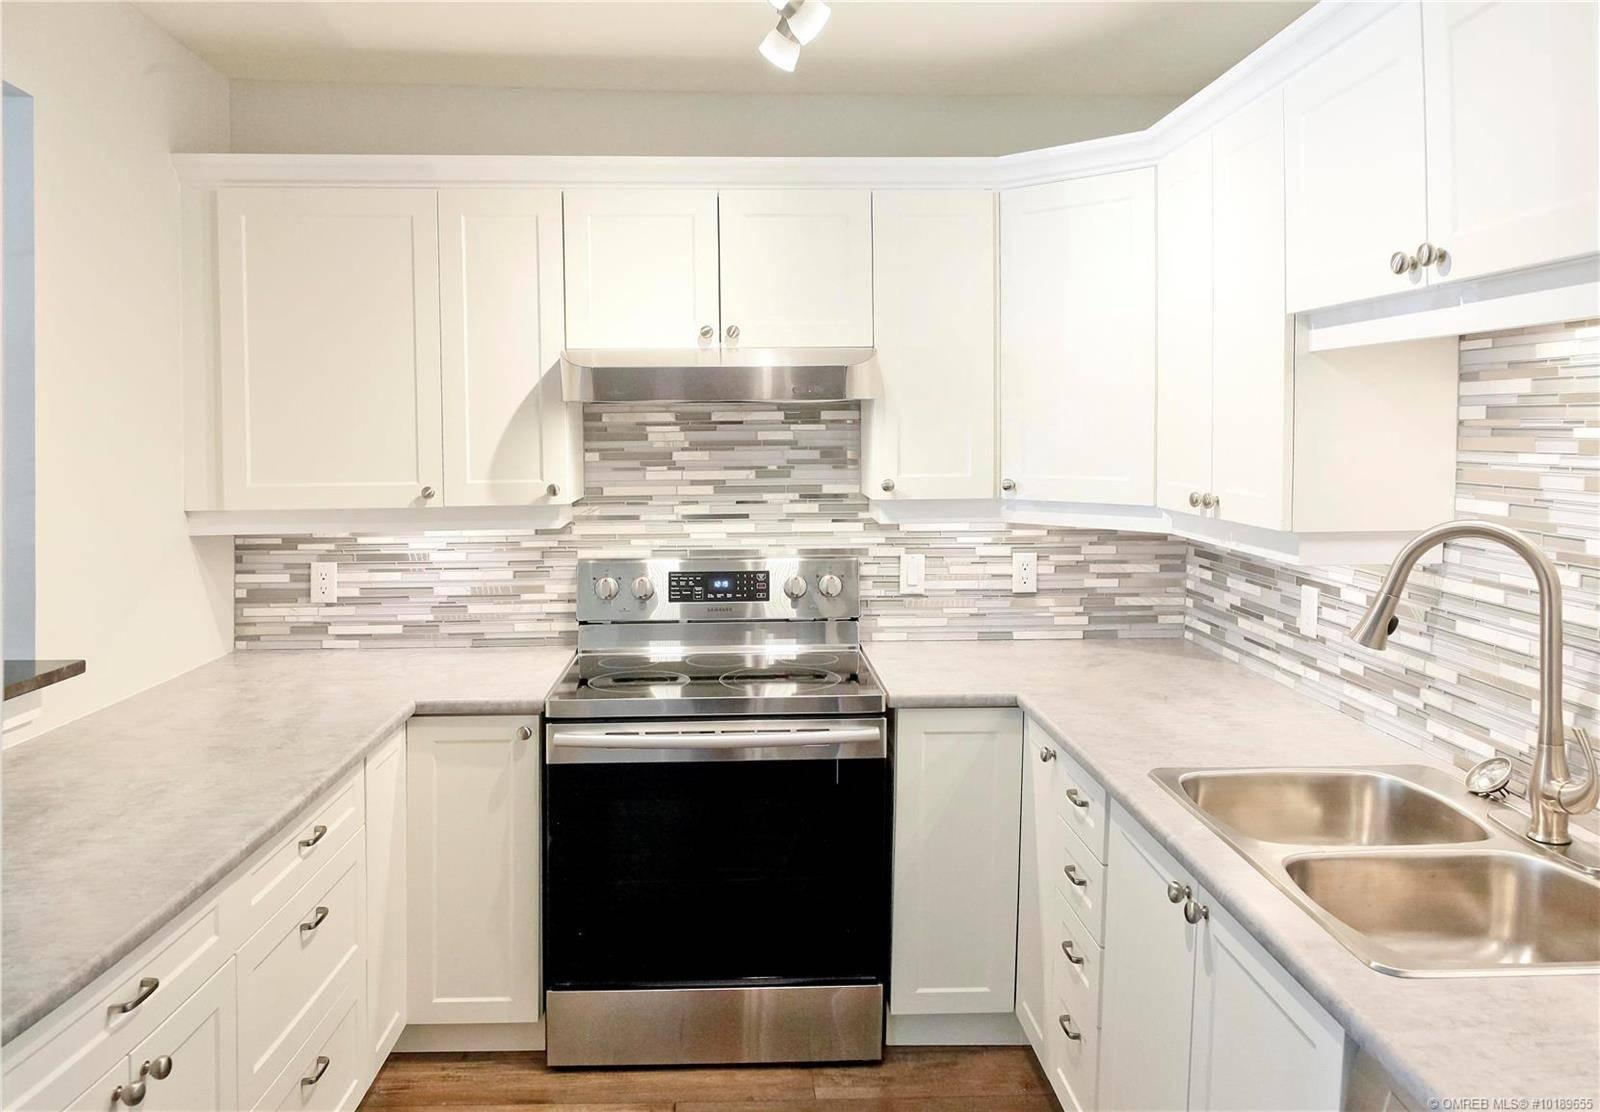 Condo for sale at 669 Houghton Rd Unit 104 Kelowna British Columbia - MLS: 10189655